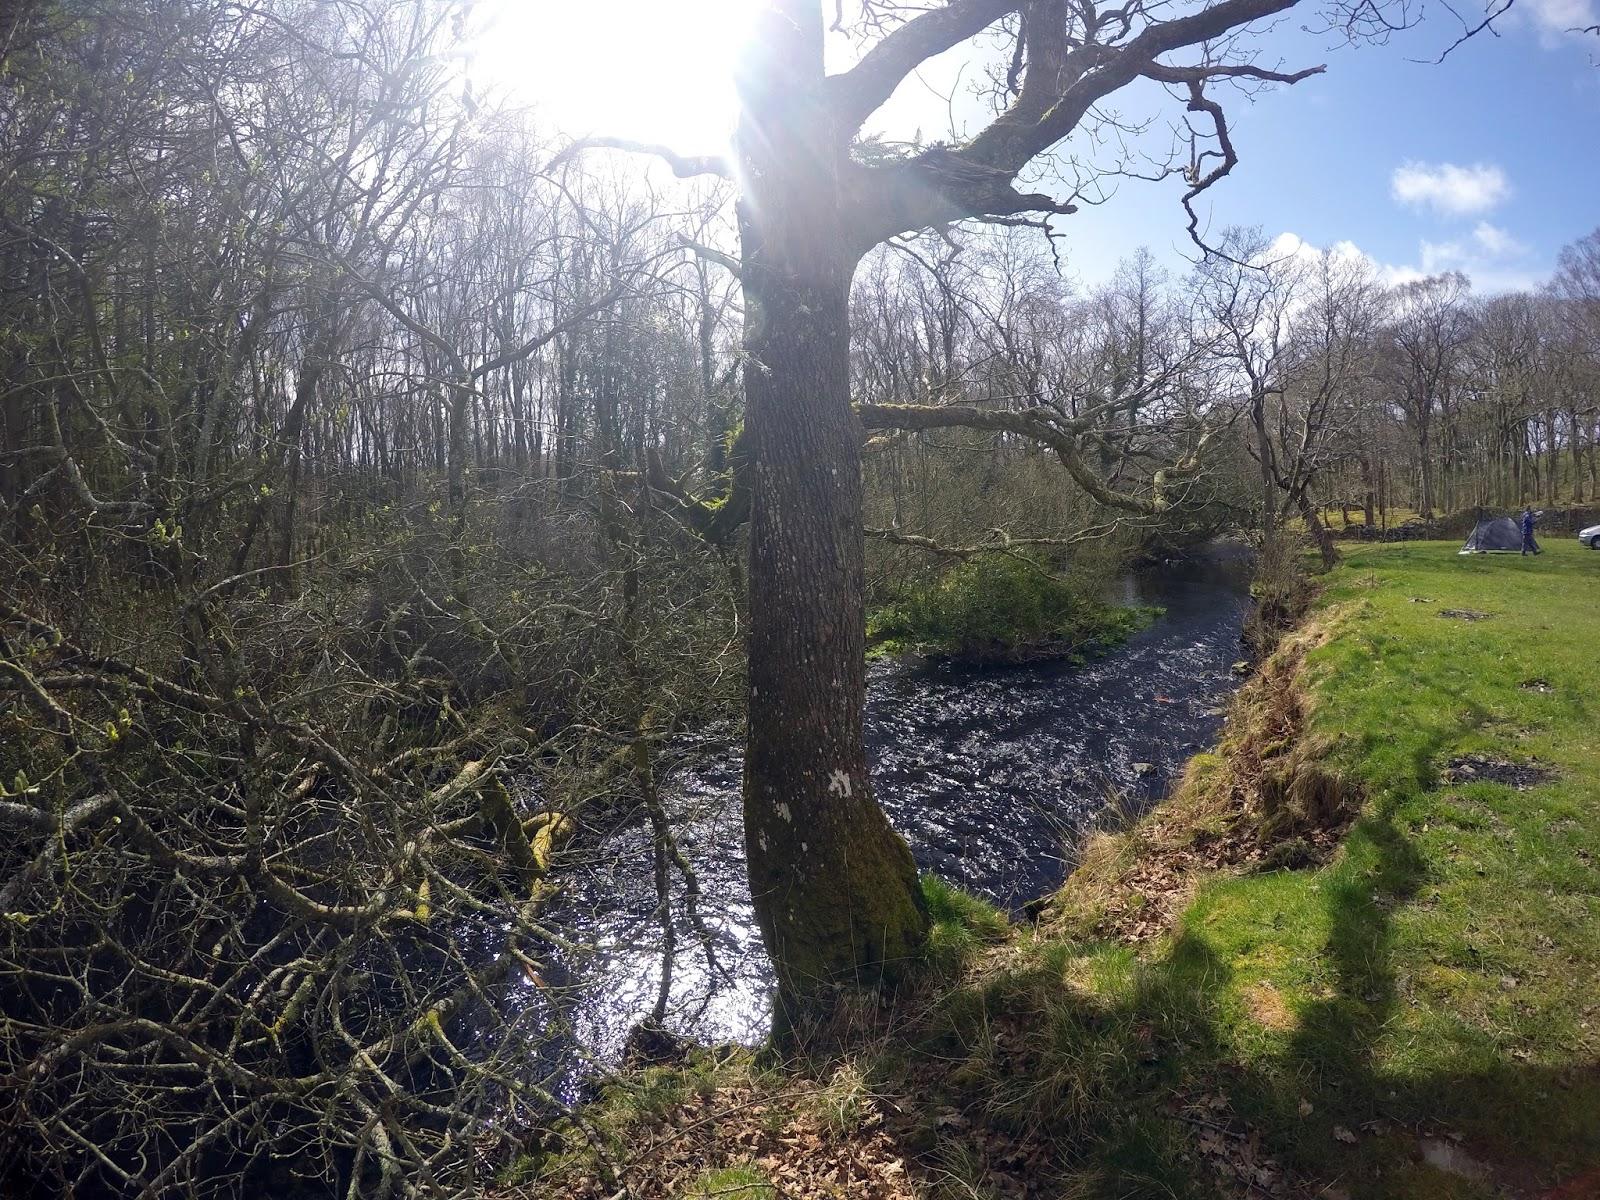 Wales, Camping, Nantcol, waterfall, nature, stars, galaxy, exploring, natural, digital detox, reconnecting, live every day, UK, Snowdonia, Welsh, adventure, travel